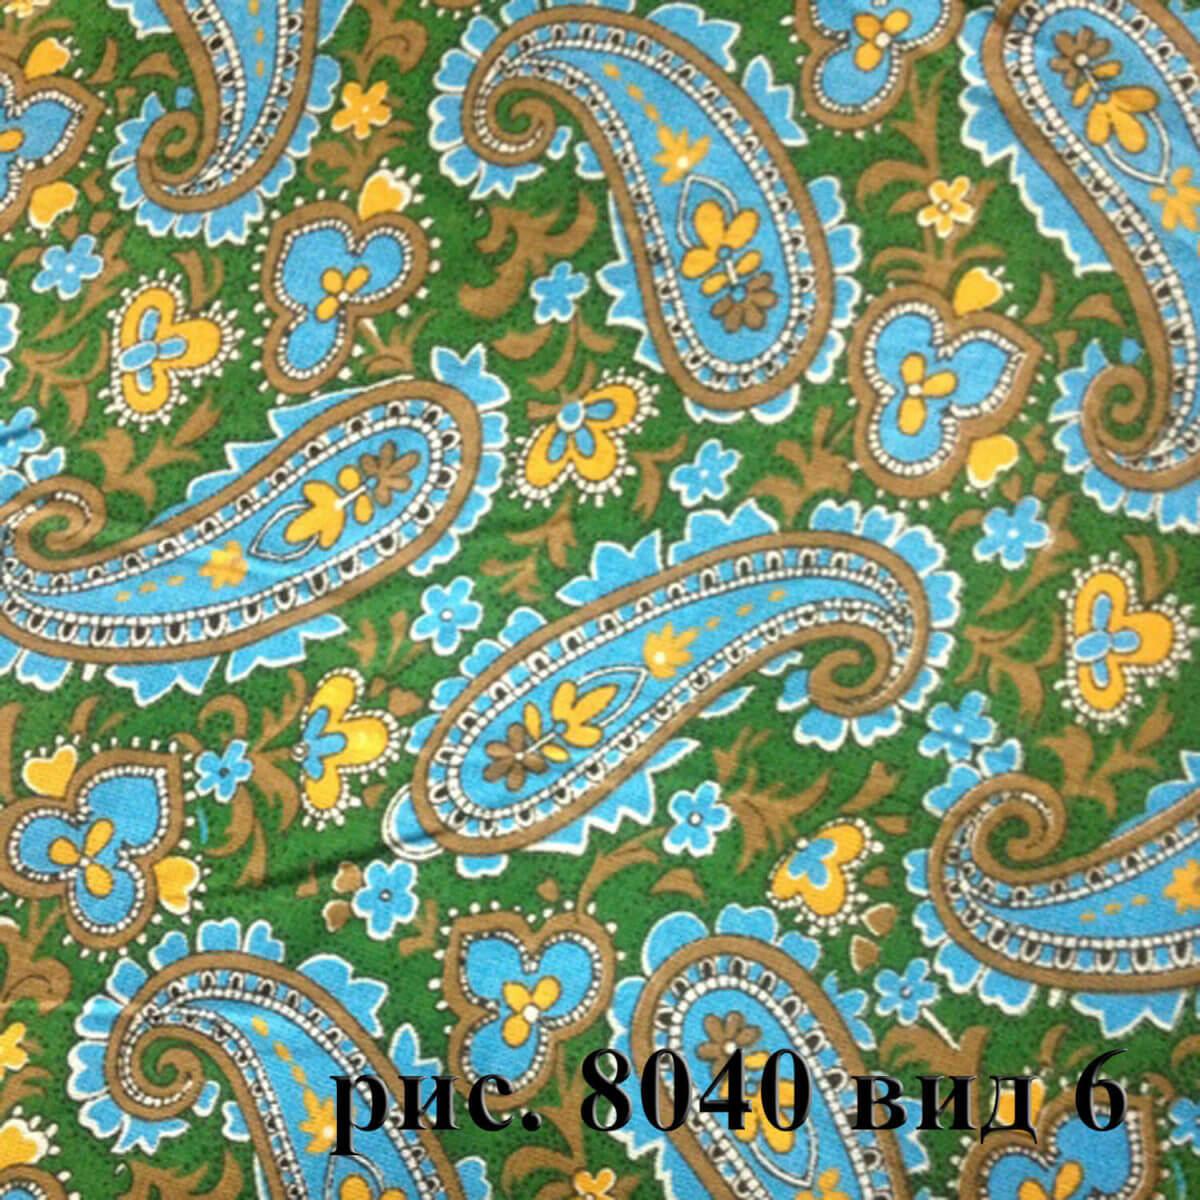 Фото 23 - Плательная ткань бязь 150 см (8040/10) Под заказ.